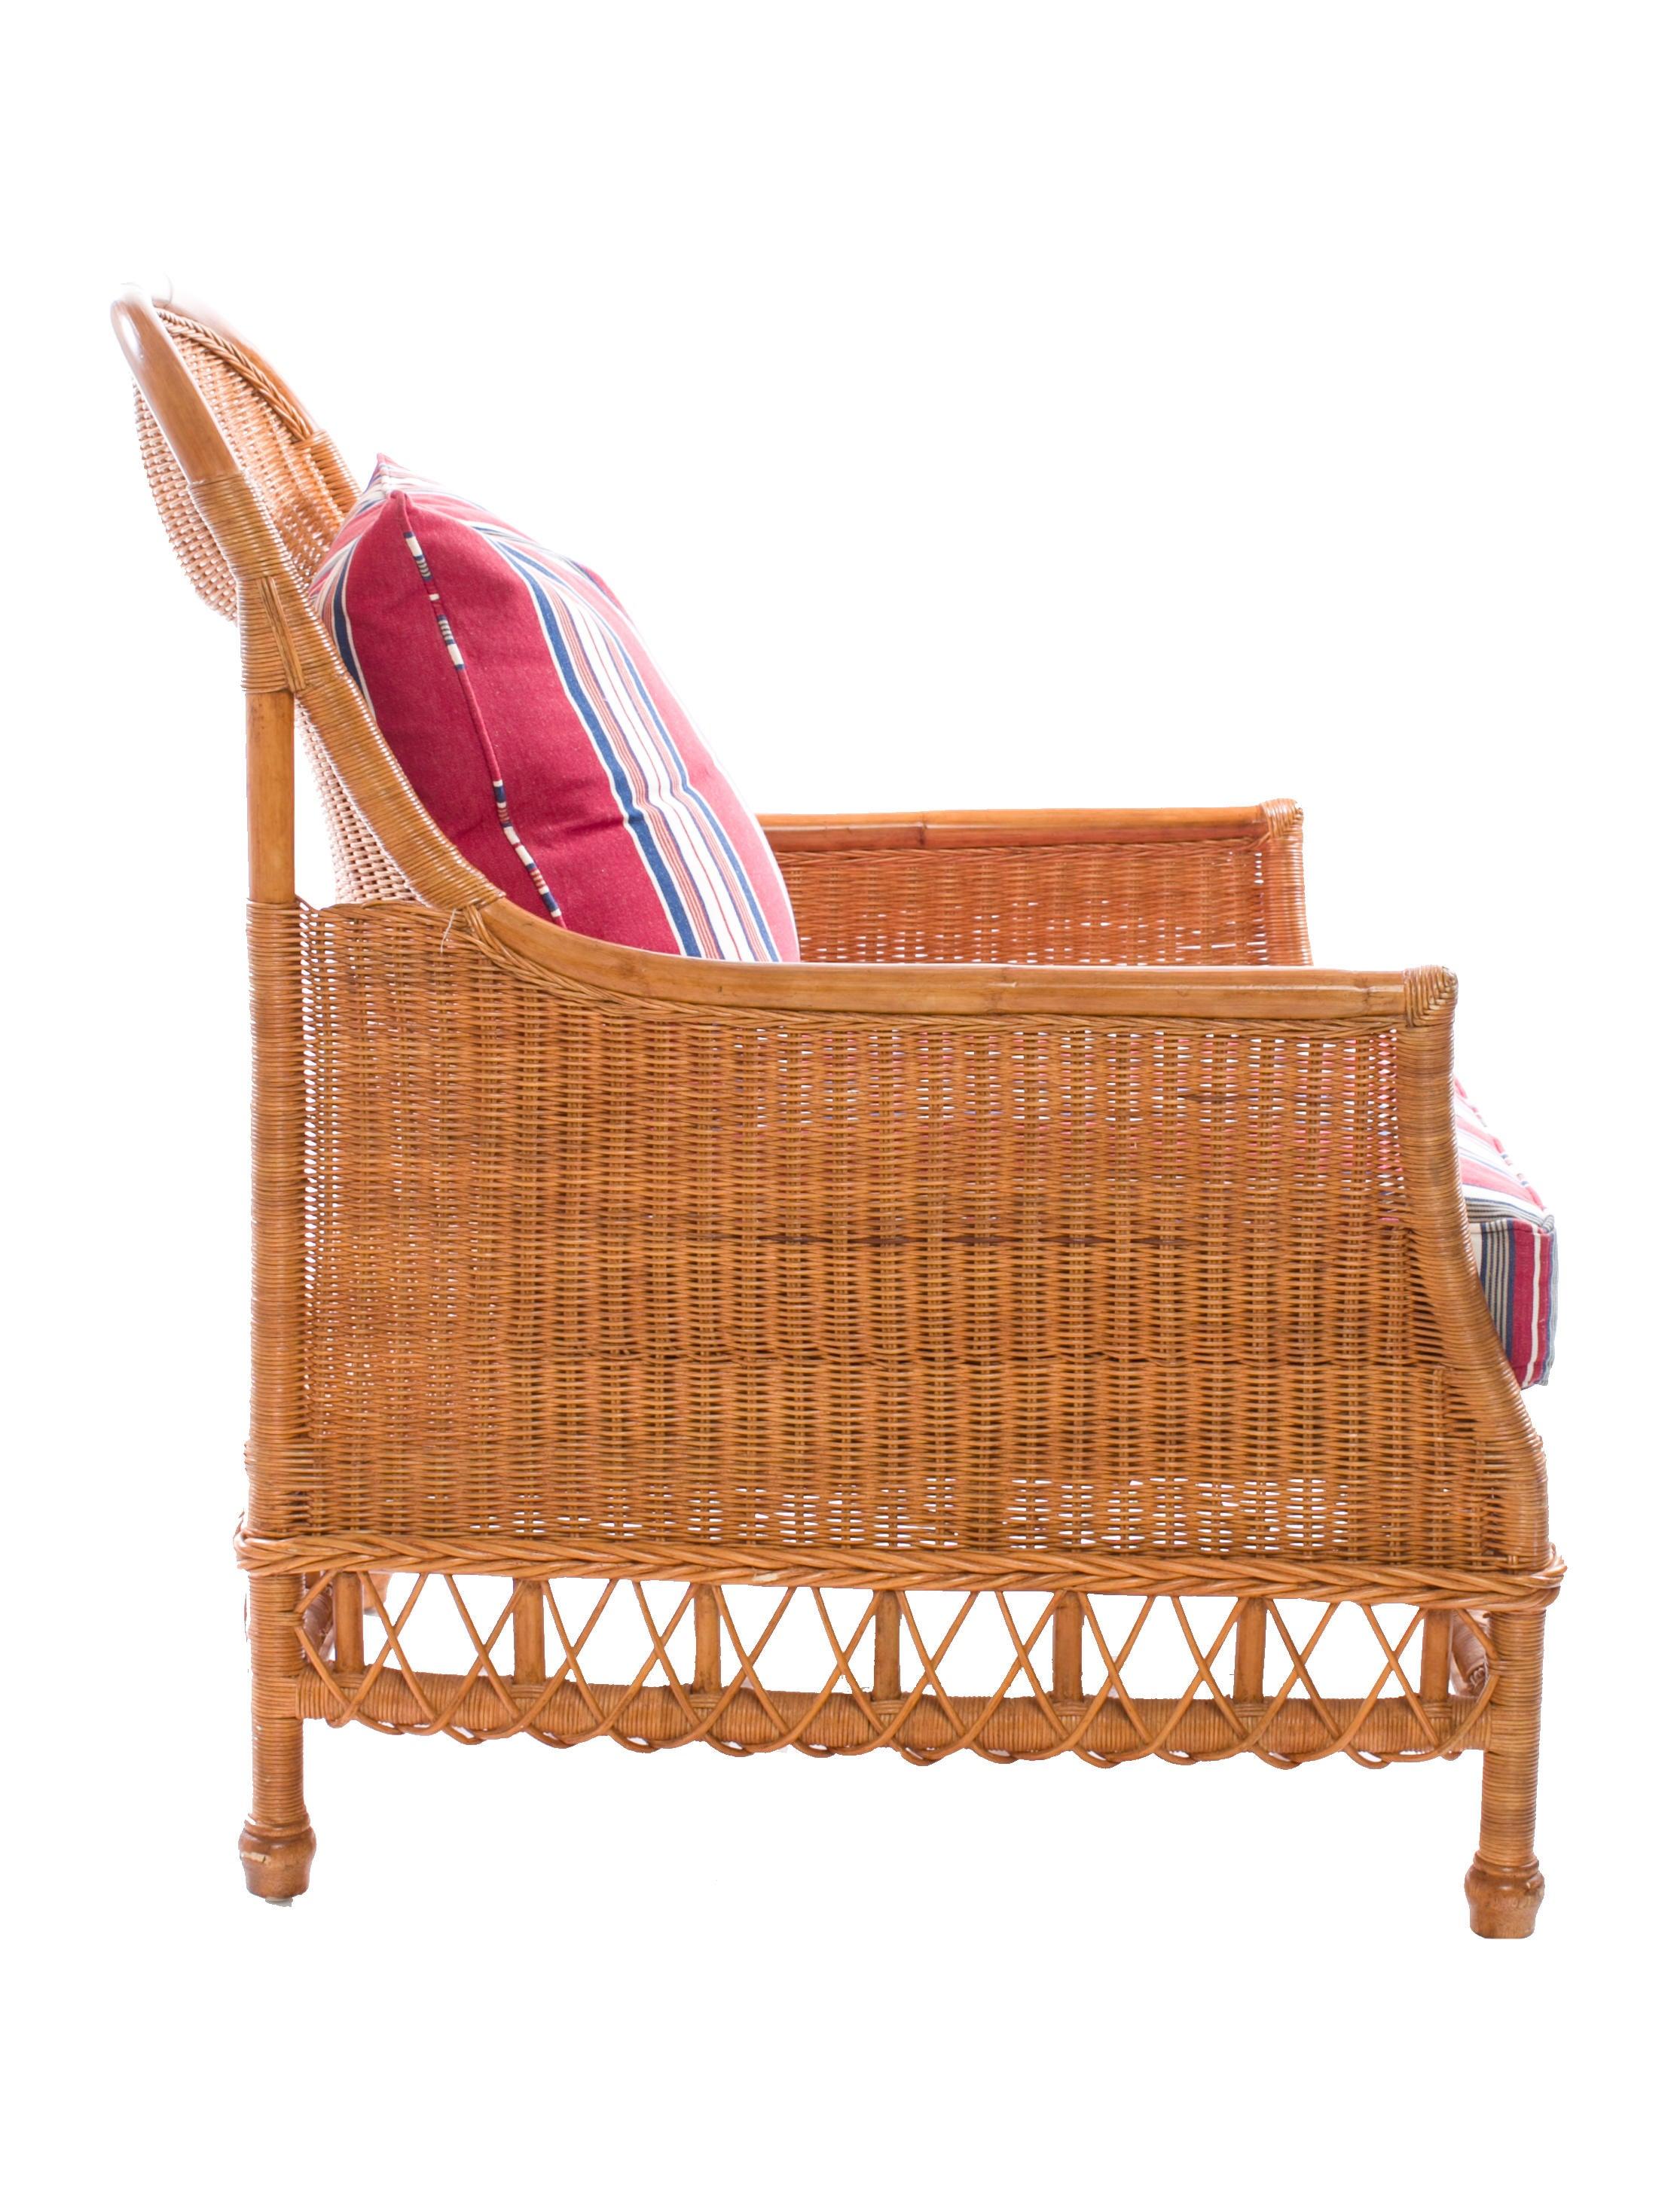 Ralph Lauren American Villa Wicker Chair Furniture